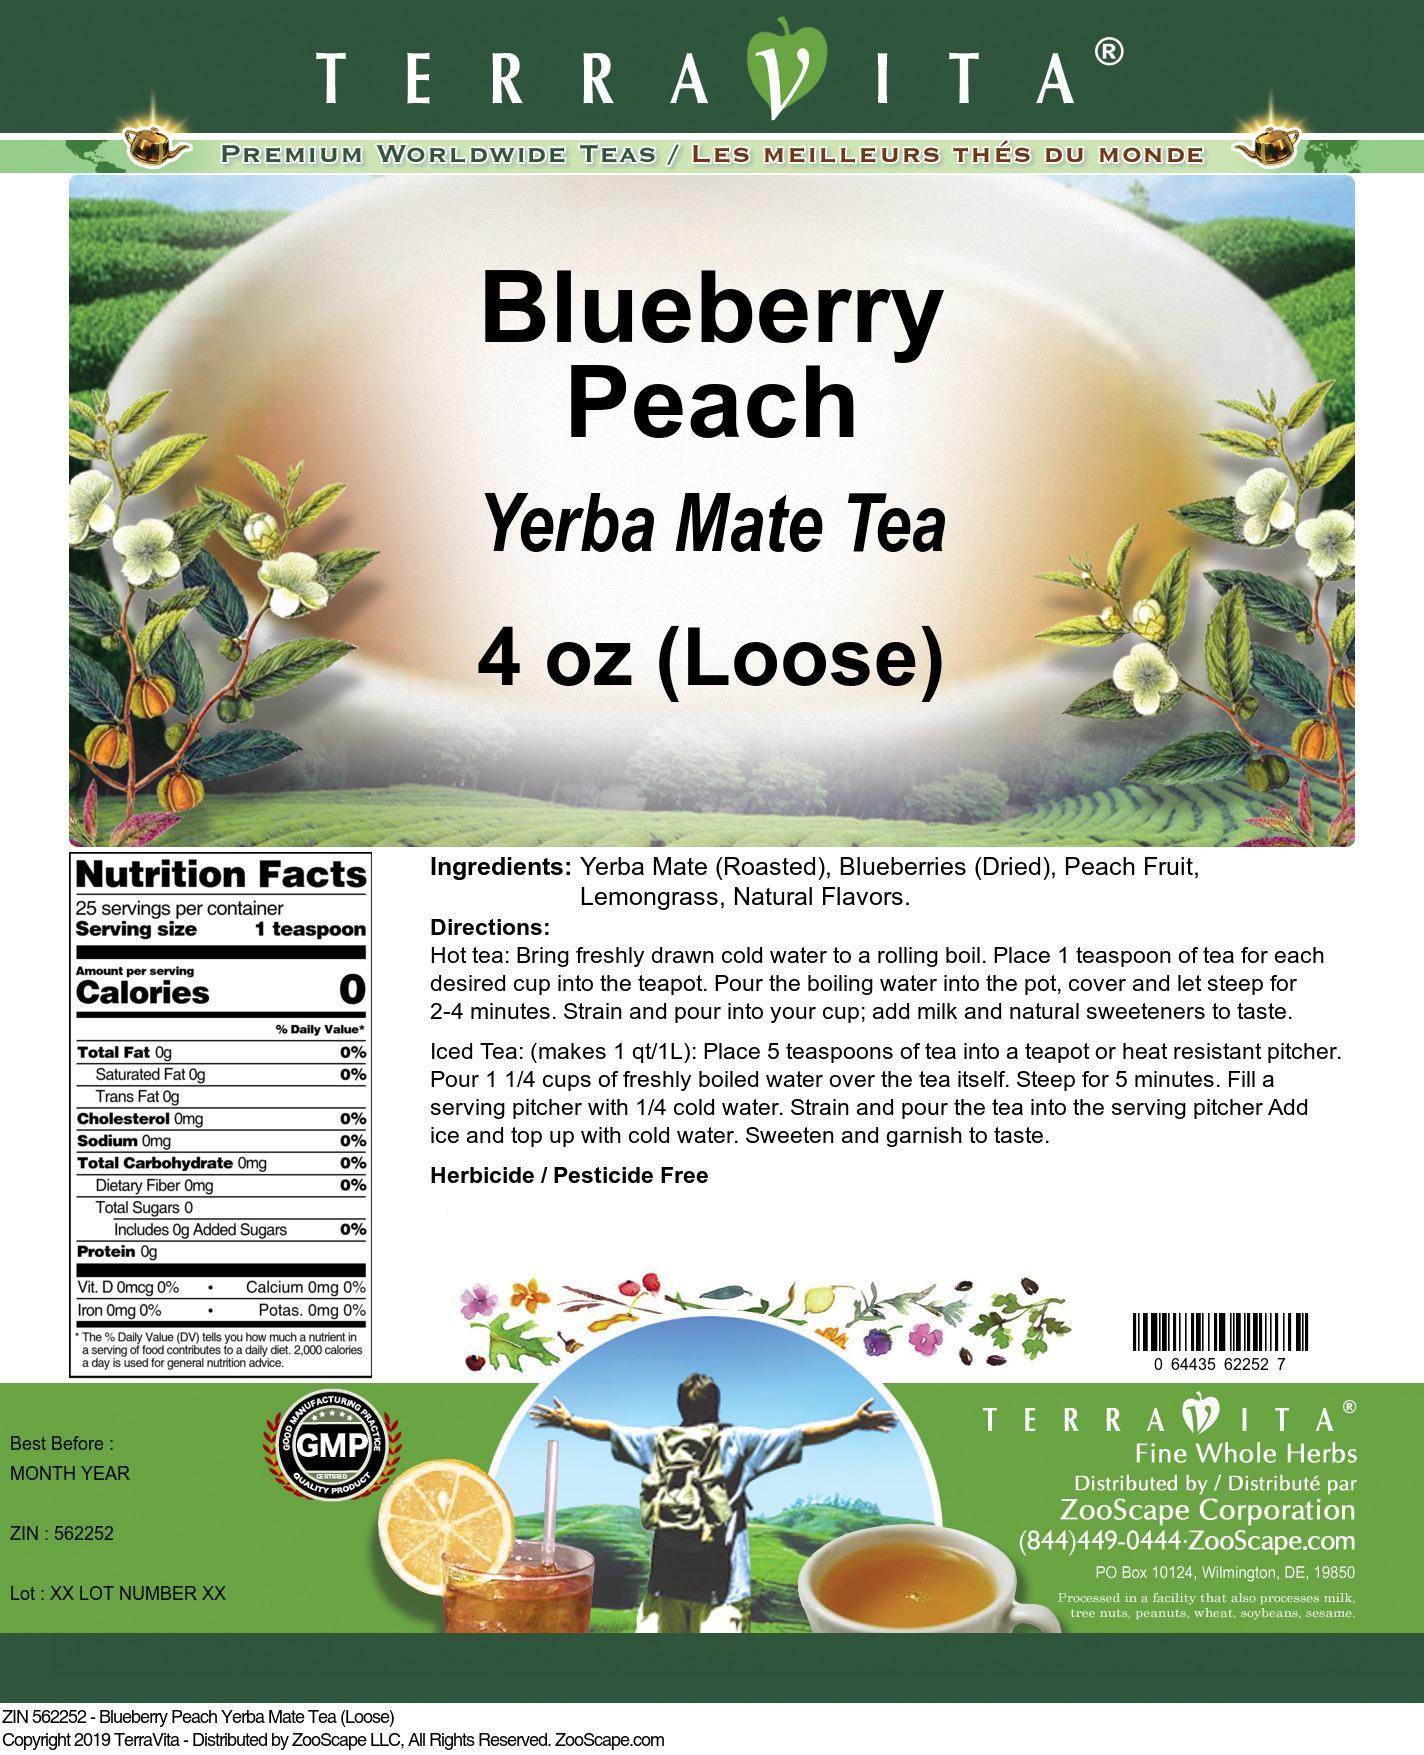 Blueberry Peach Yerba Mate